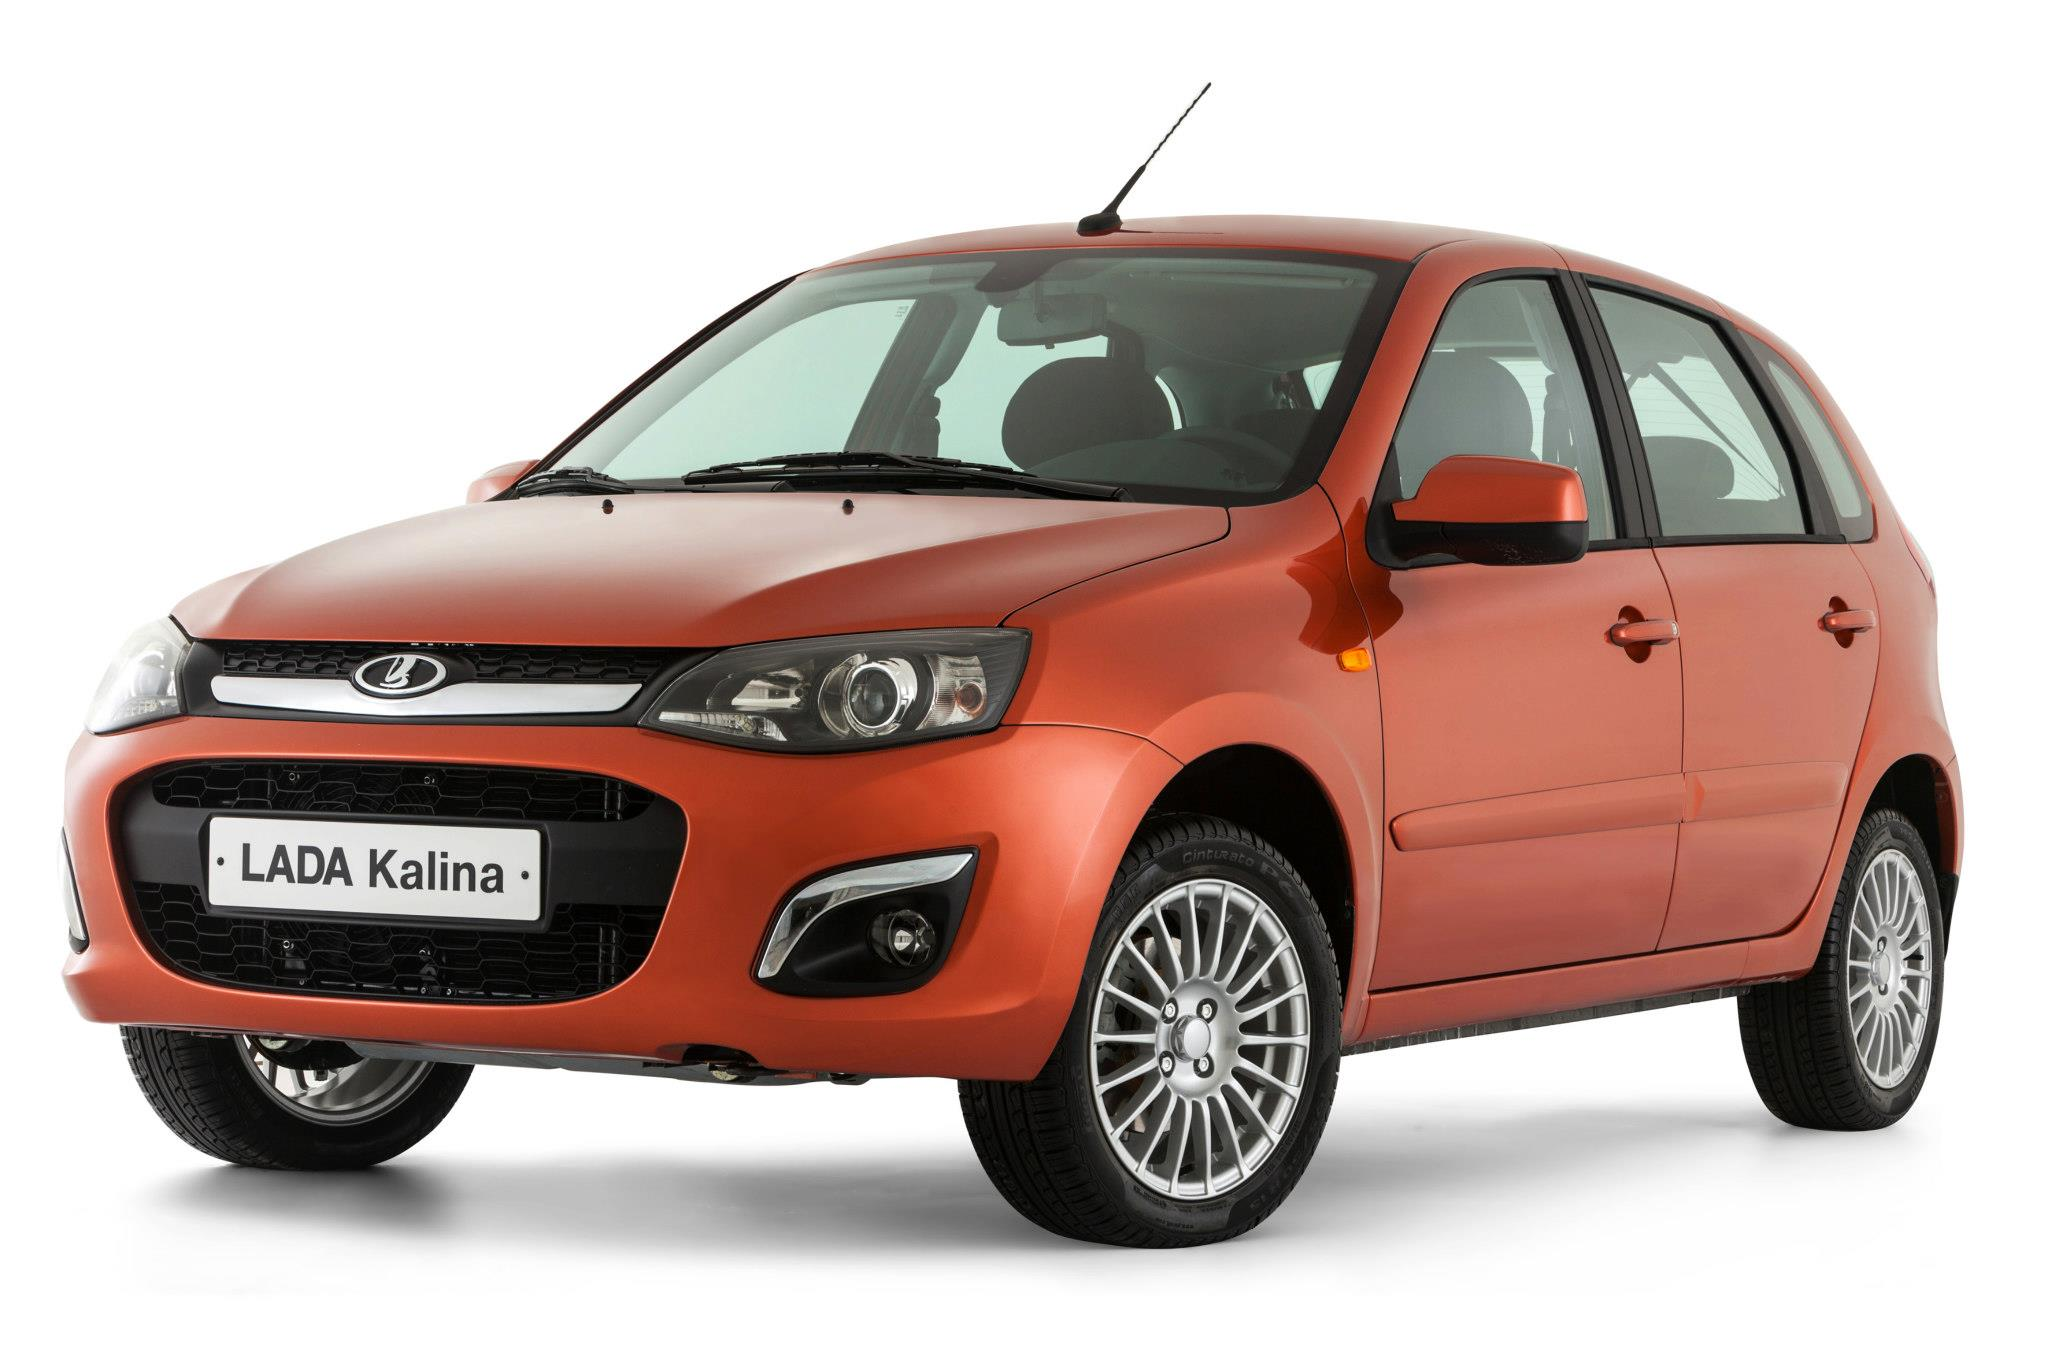 New Honda Pilot >> 2013 Lada Kalina Debuts in Moscow